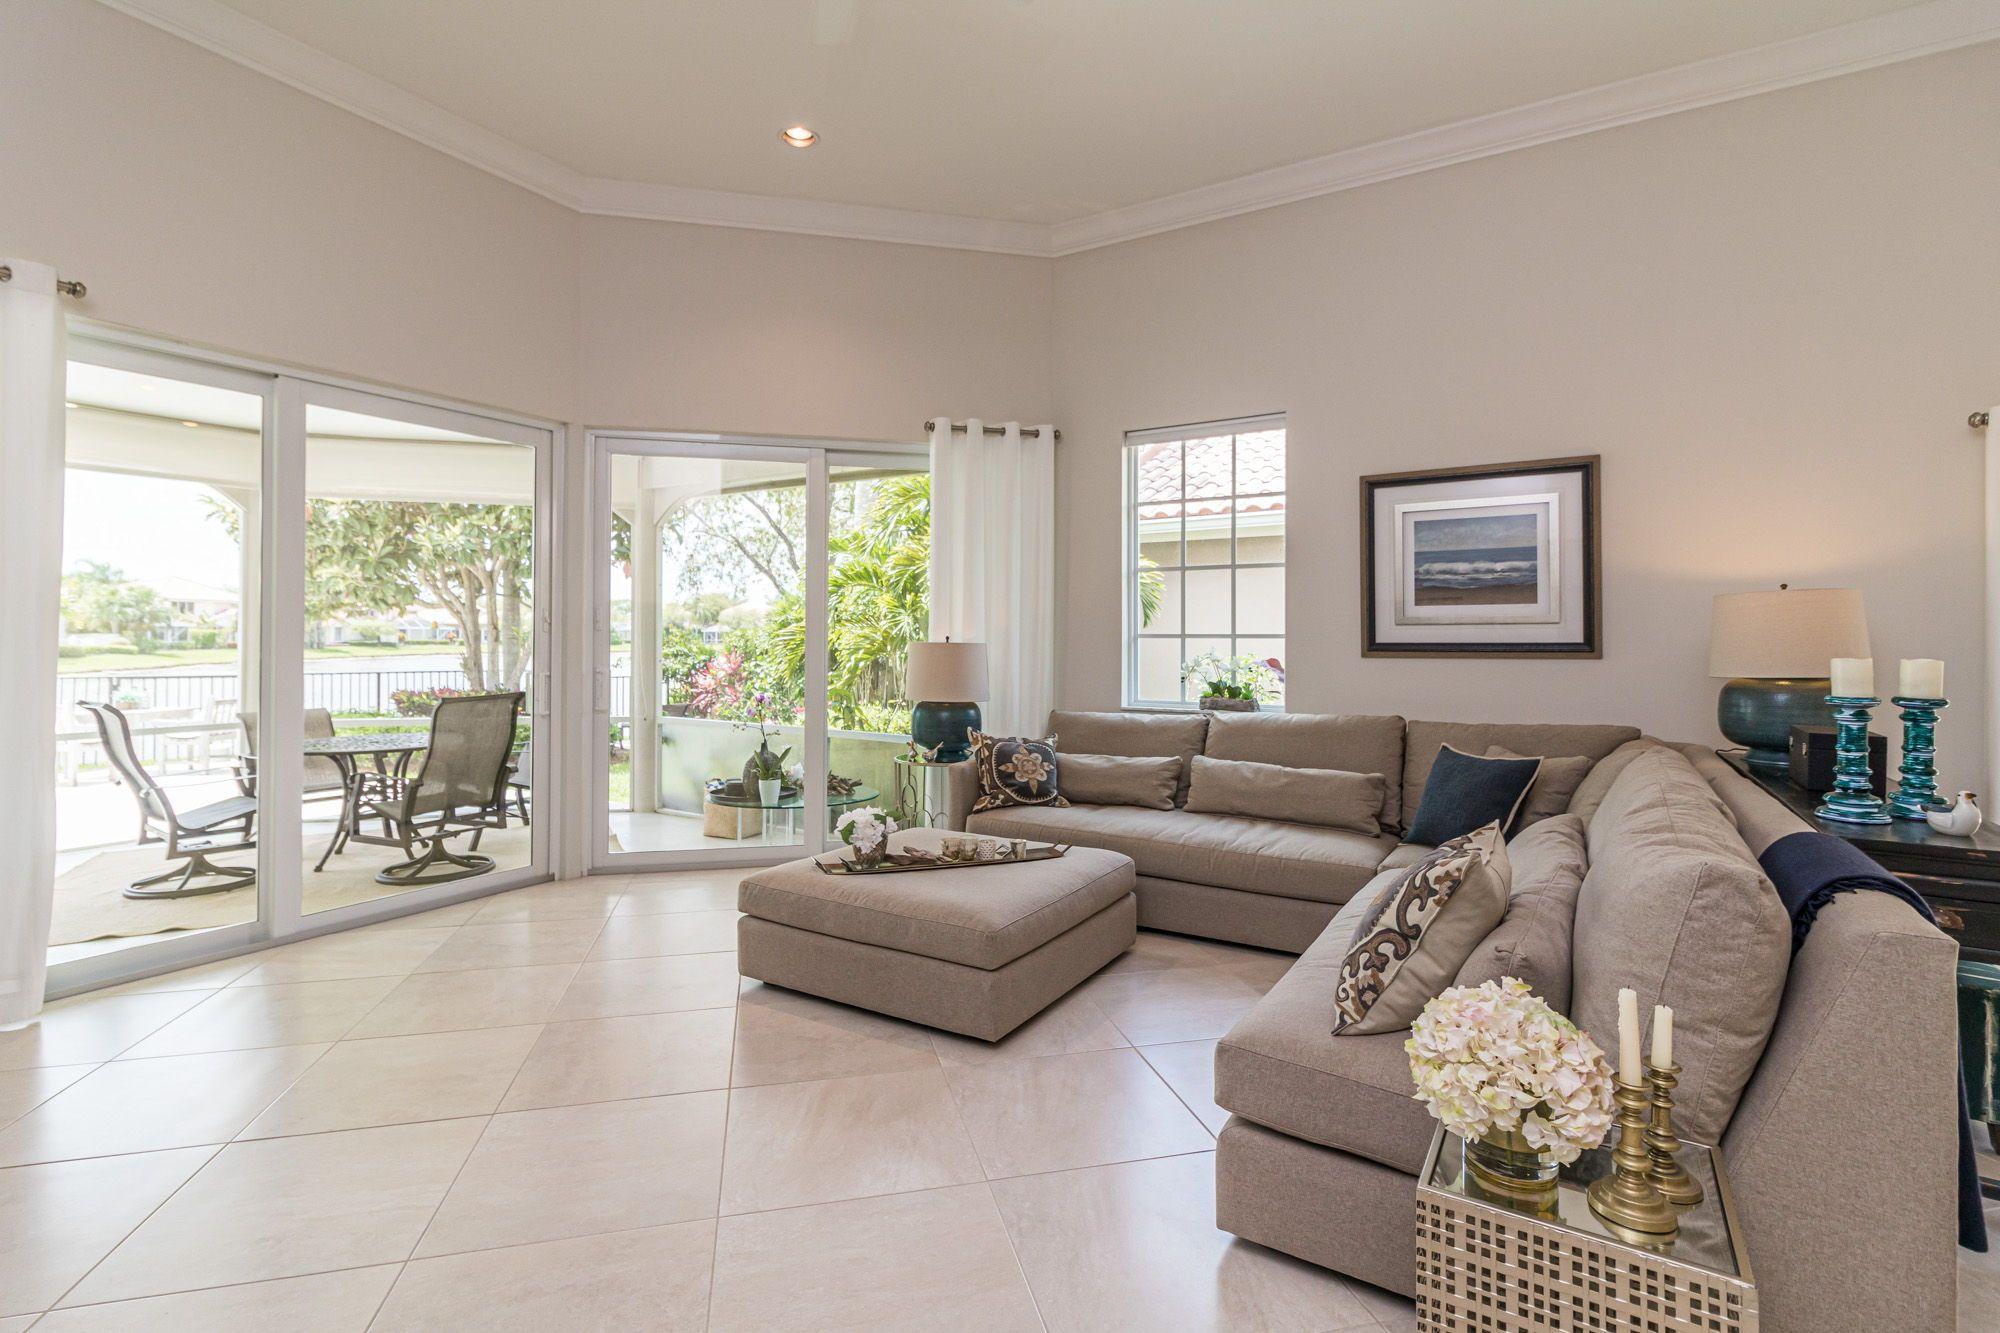 5904f76e6ac11fba0aee99fb38052373 - Rooms For Rent Palm Beach Gardens Fl